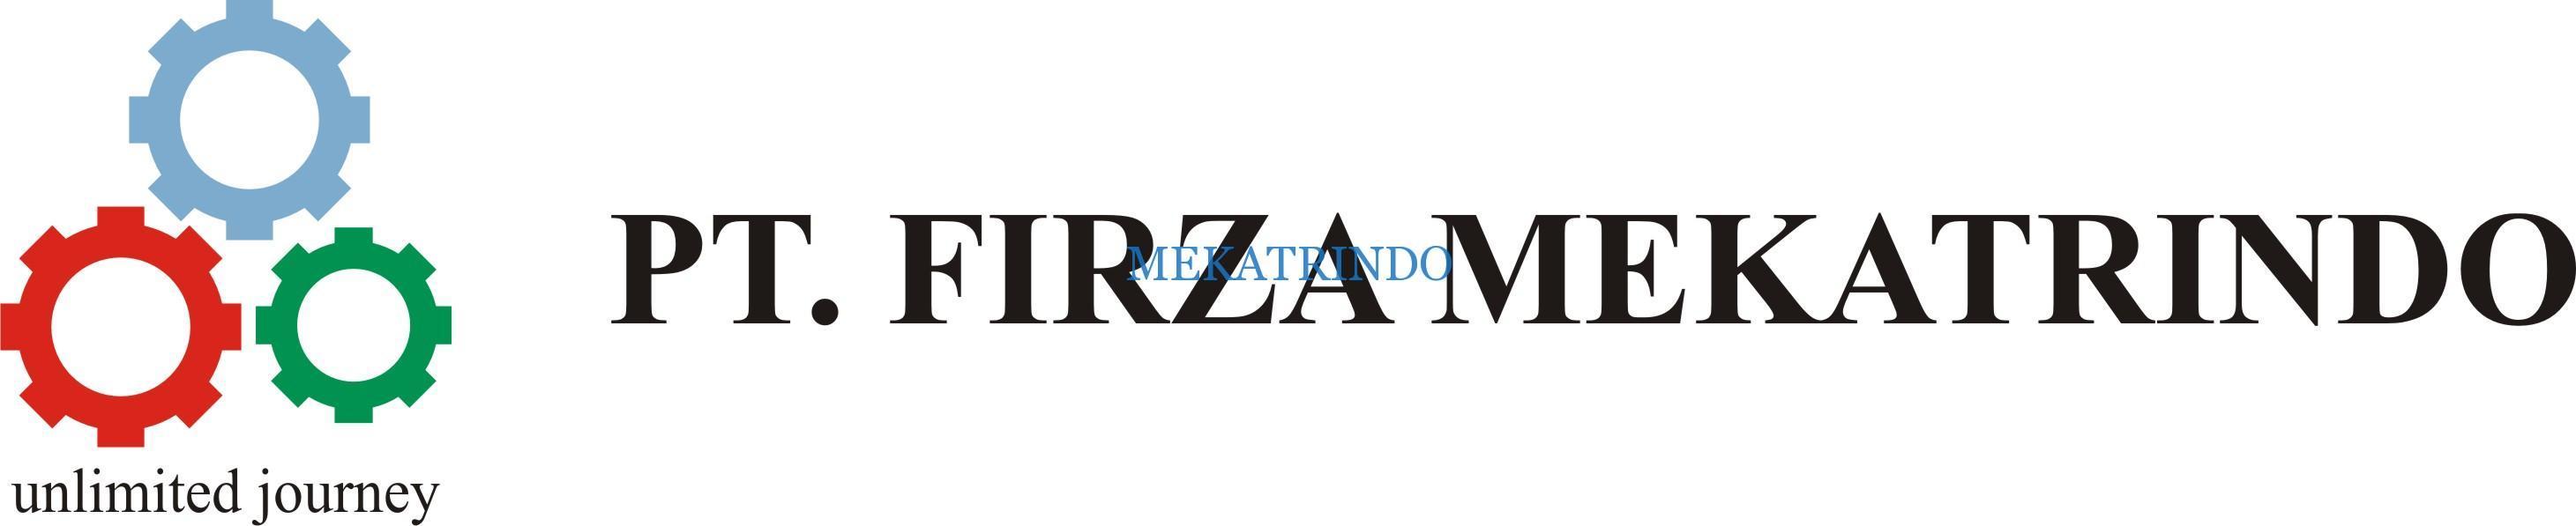 Logo PT. Firza Meka Trindo - Mekatrindo - indotraffic.net